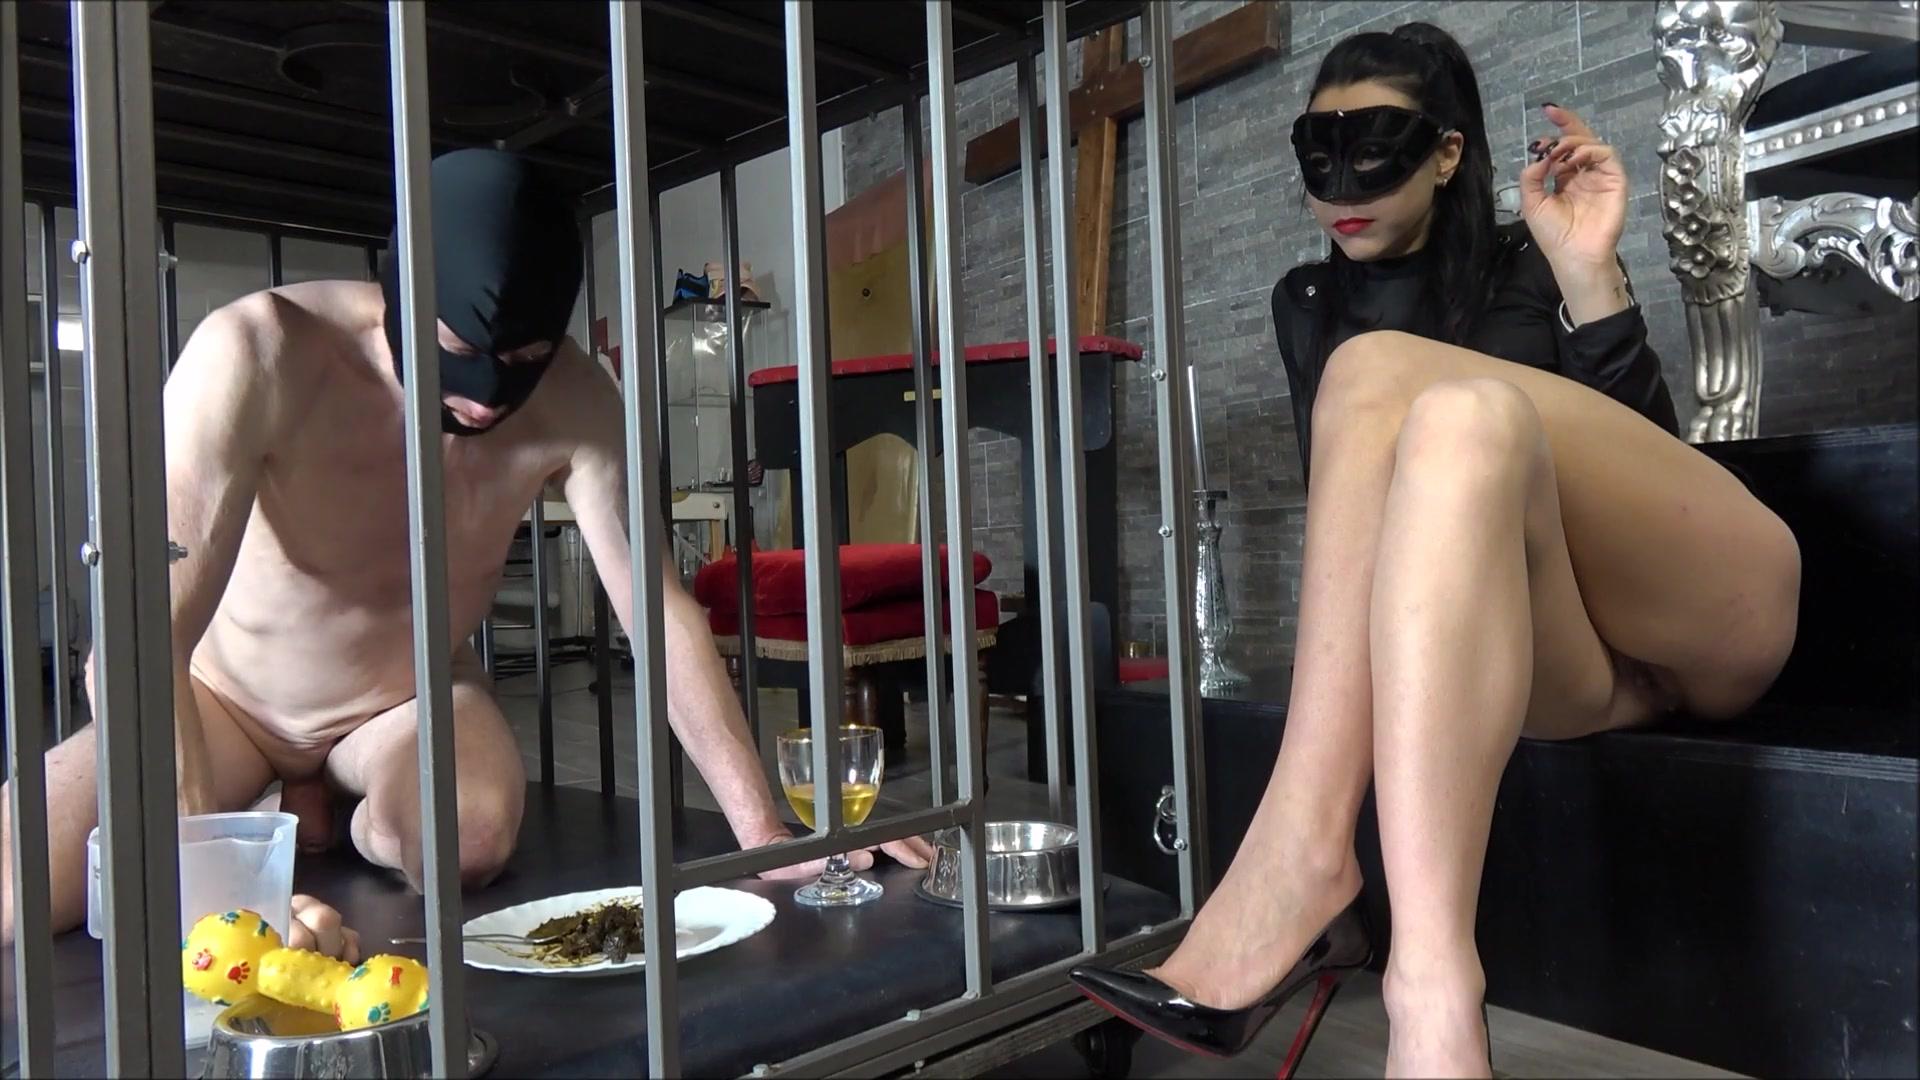 Mistress_Gaia_-_Feeding_time.00001.jpg